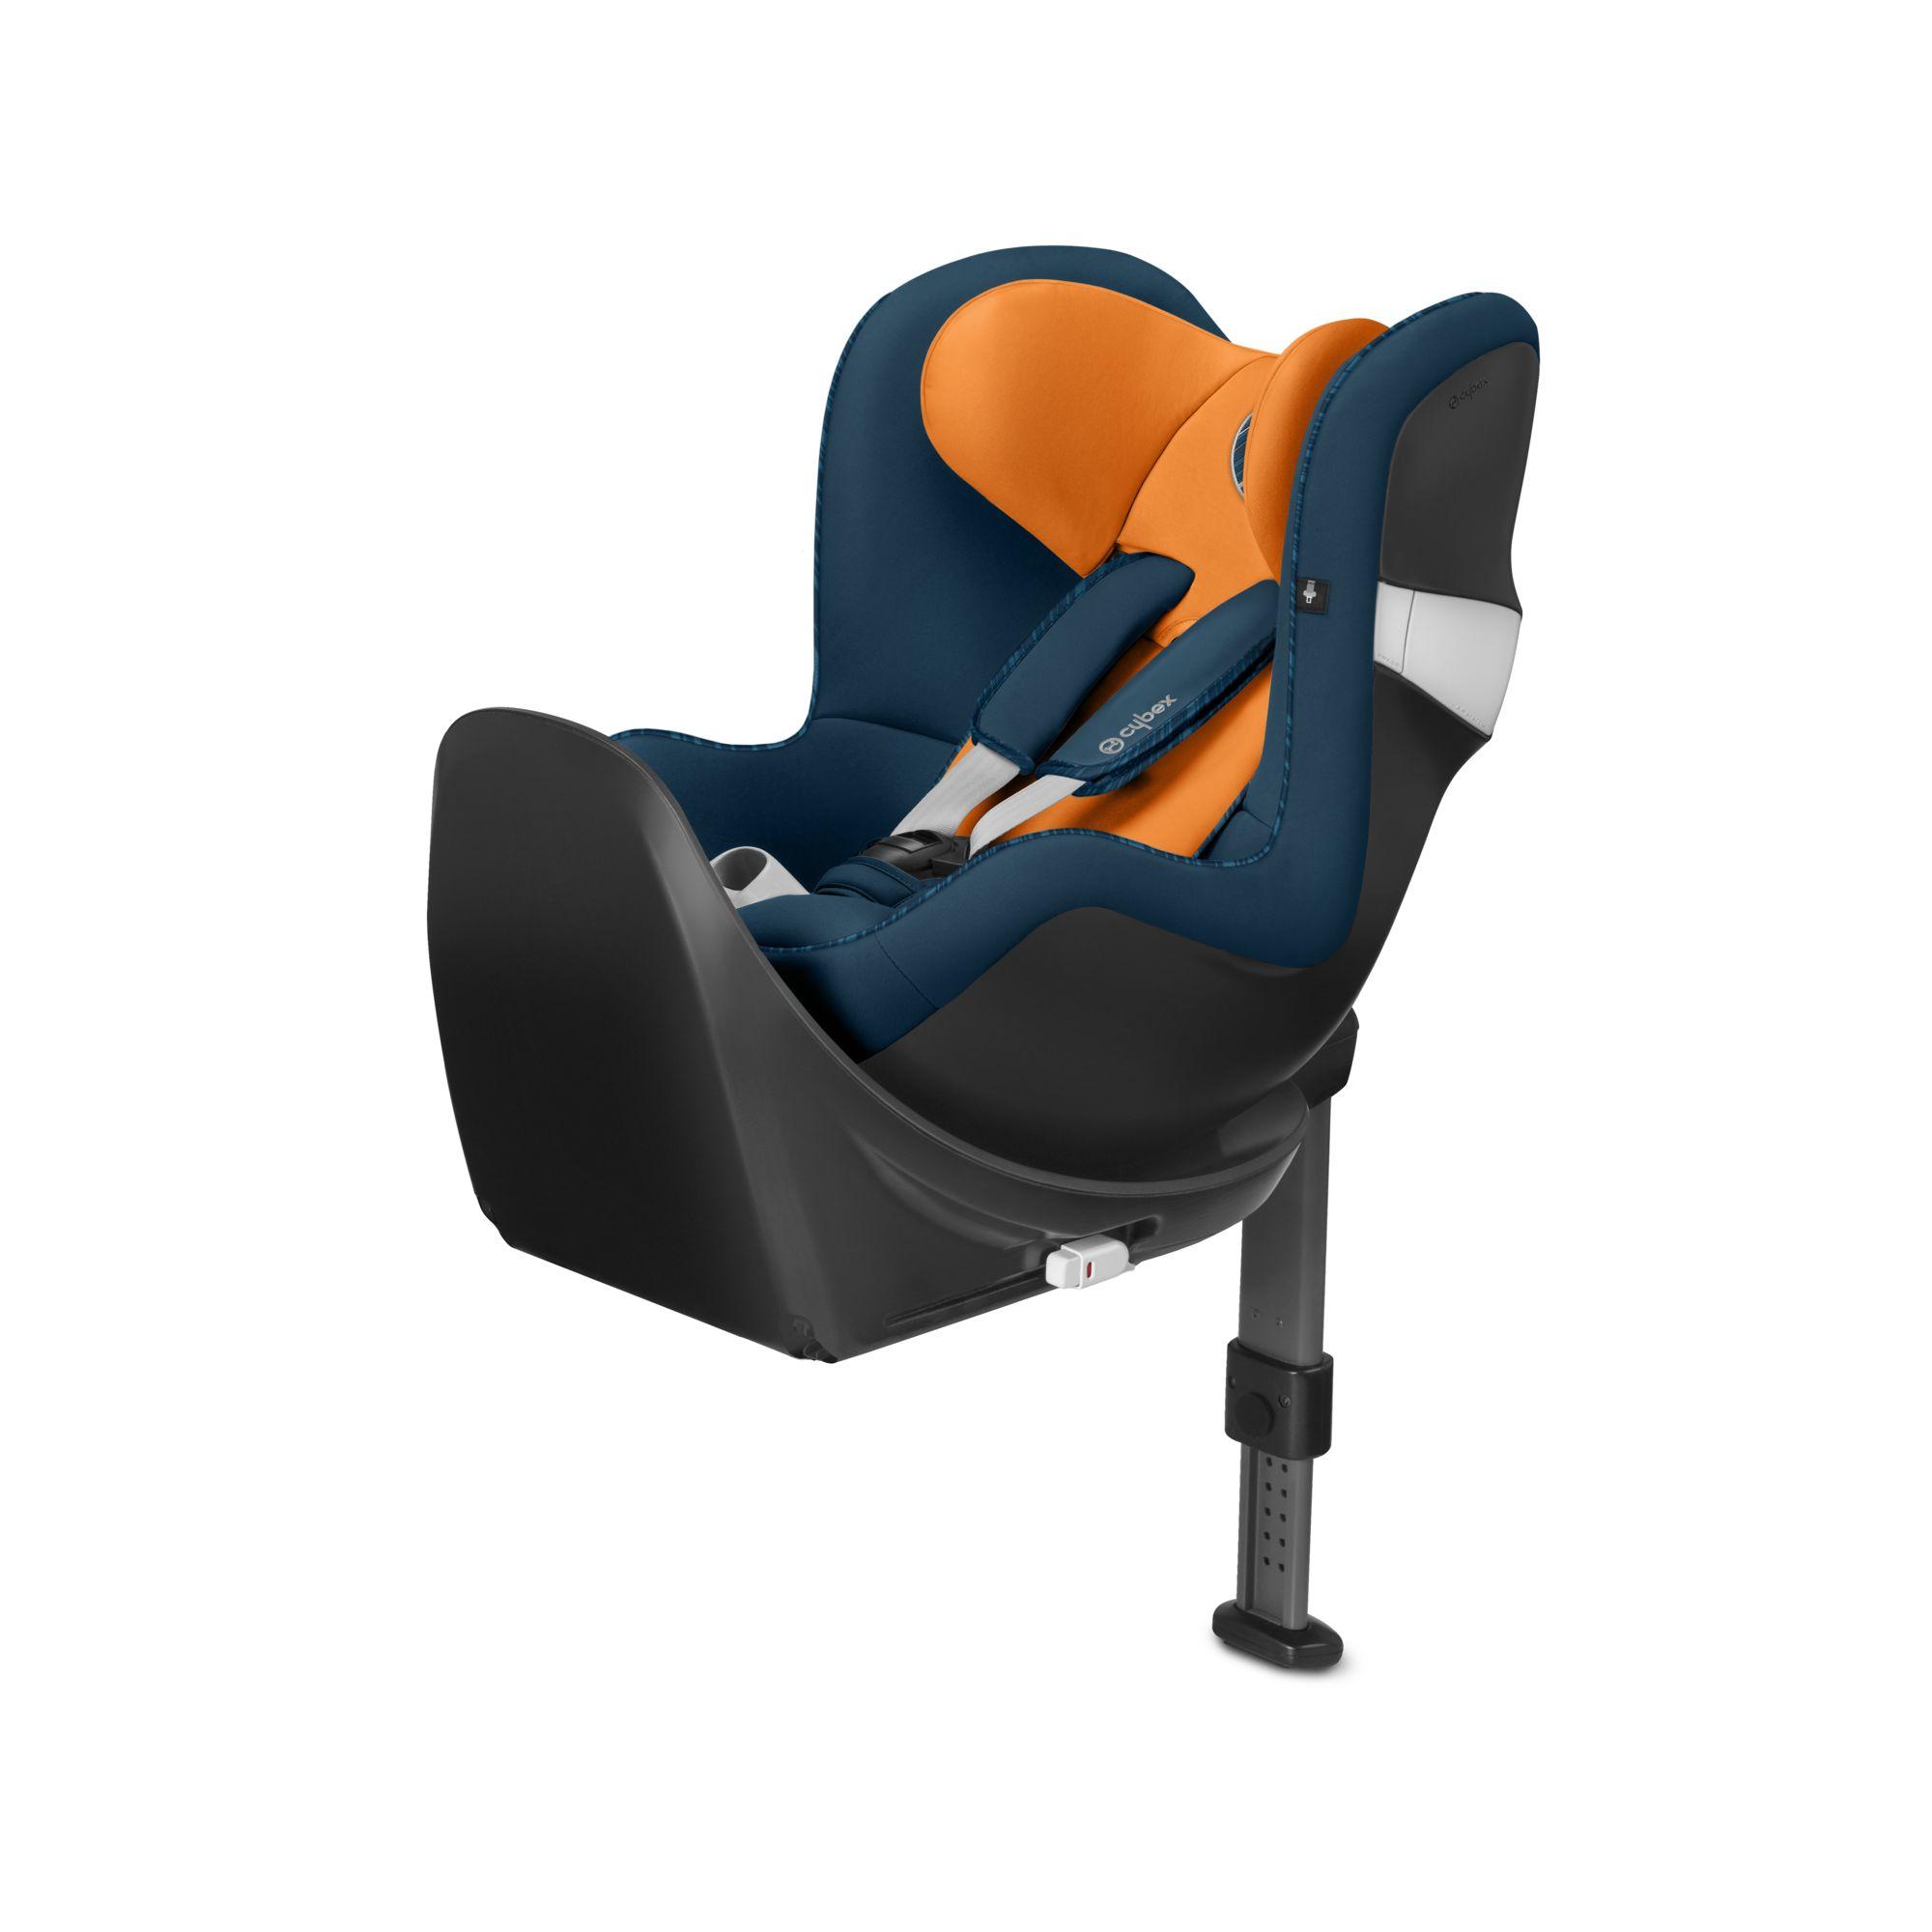 cybex showroom babyschalen und kindersitze die zwergperten babyschalen reboarder kindersitze. Black Bedroom Furniture Sets. Home Design Ideas